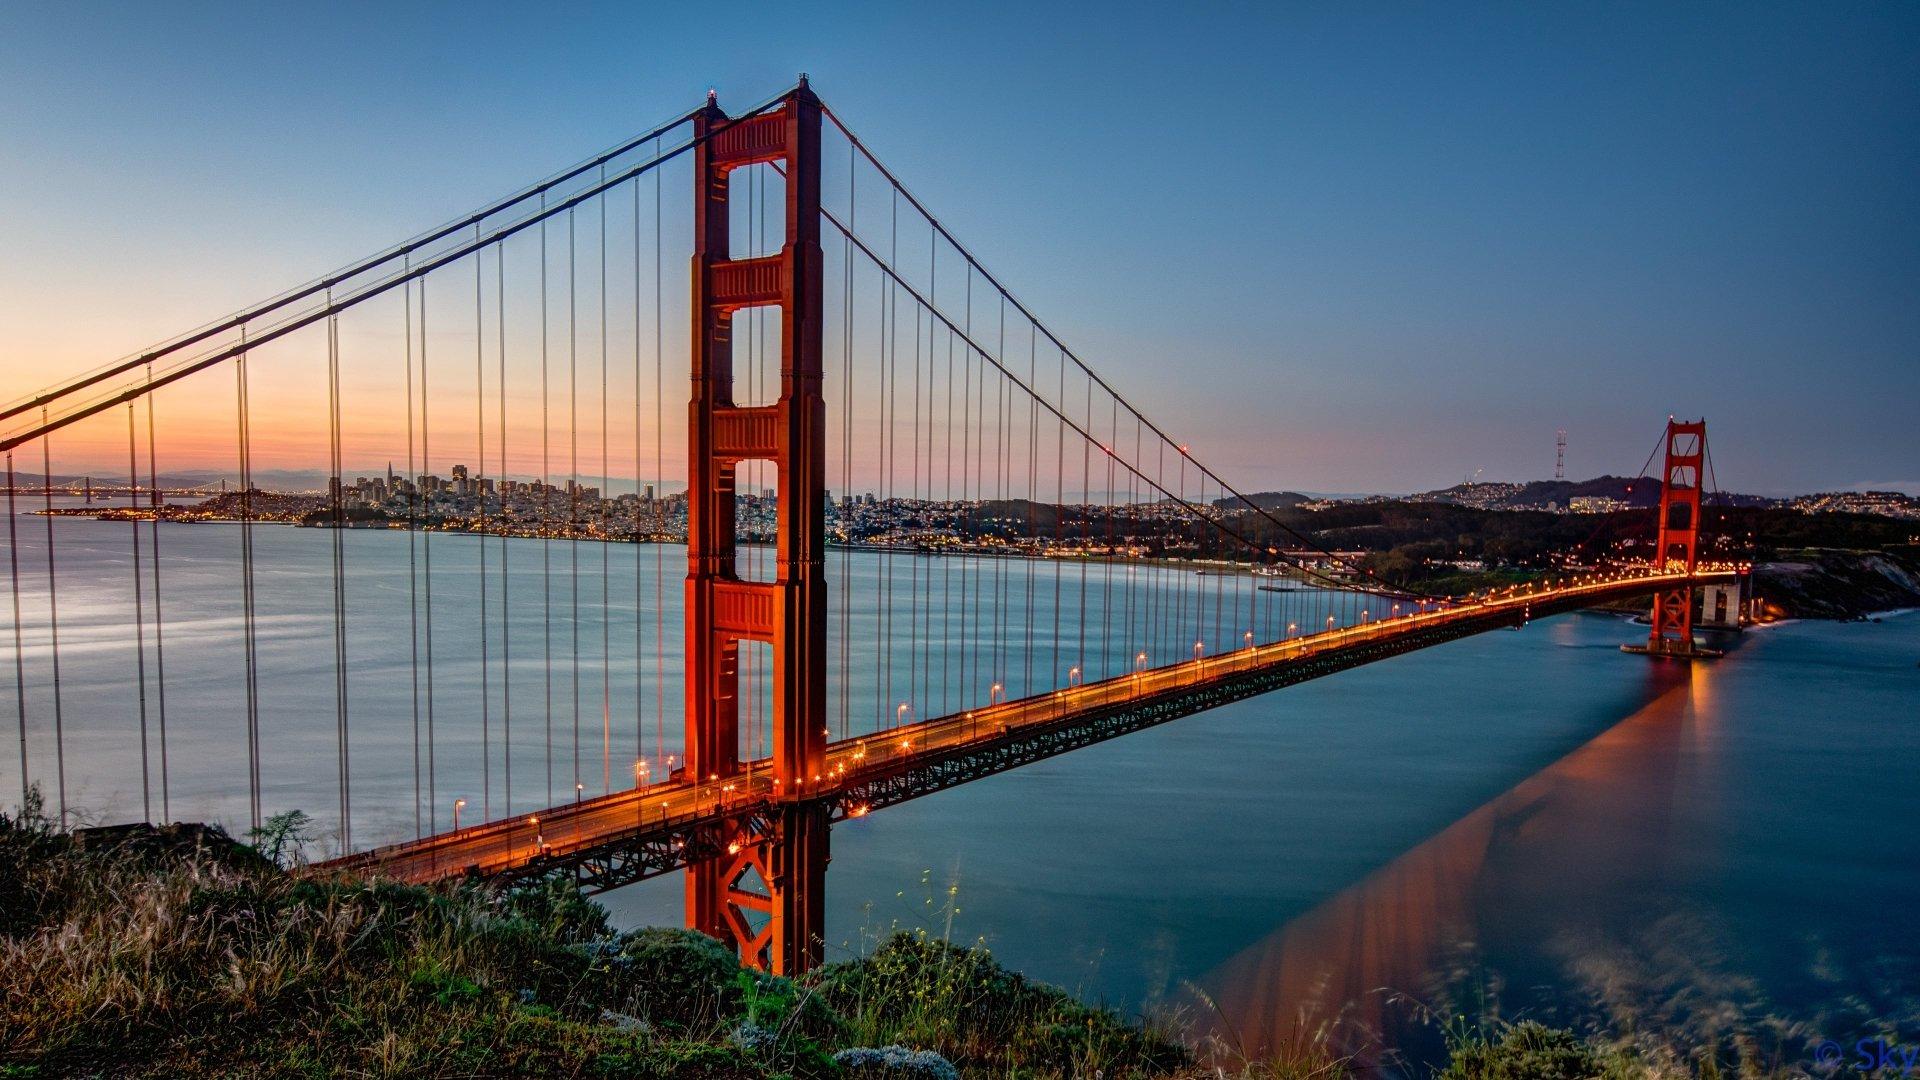 Golden Gate 4k Ultra HD Wallpaper  Sfondi  3840x2160  ID549228  Wallpaper Abyss